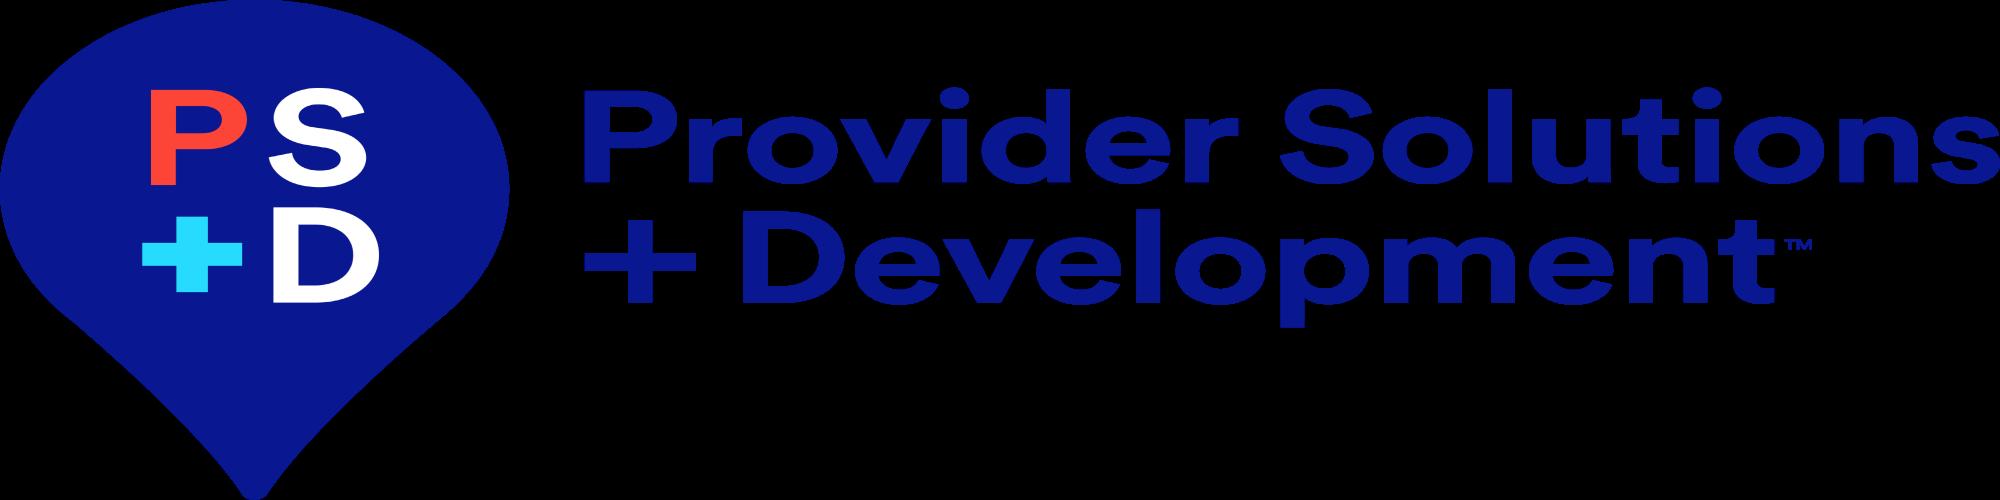 Provider Solutions + Development